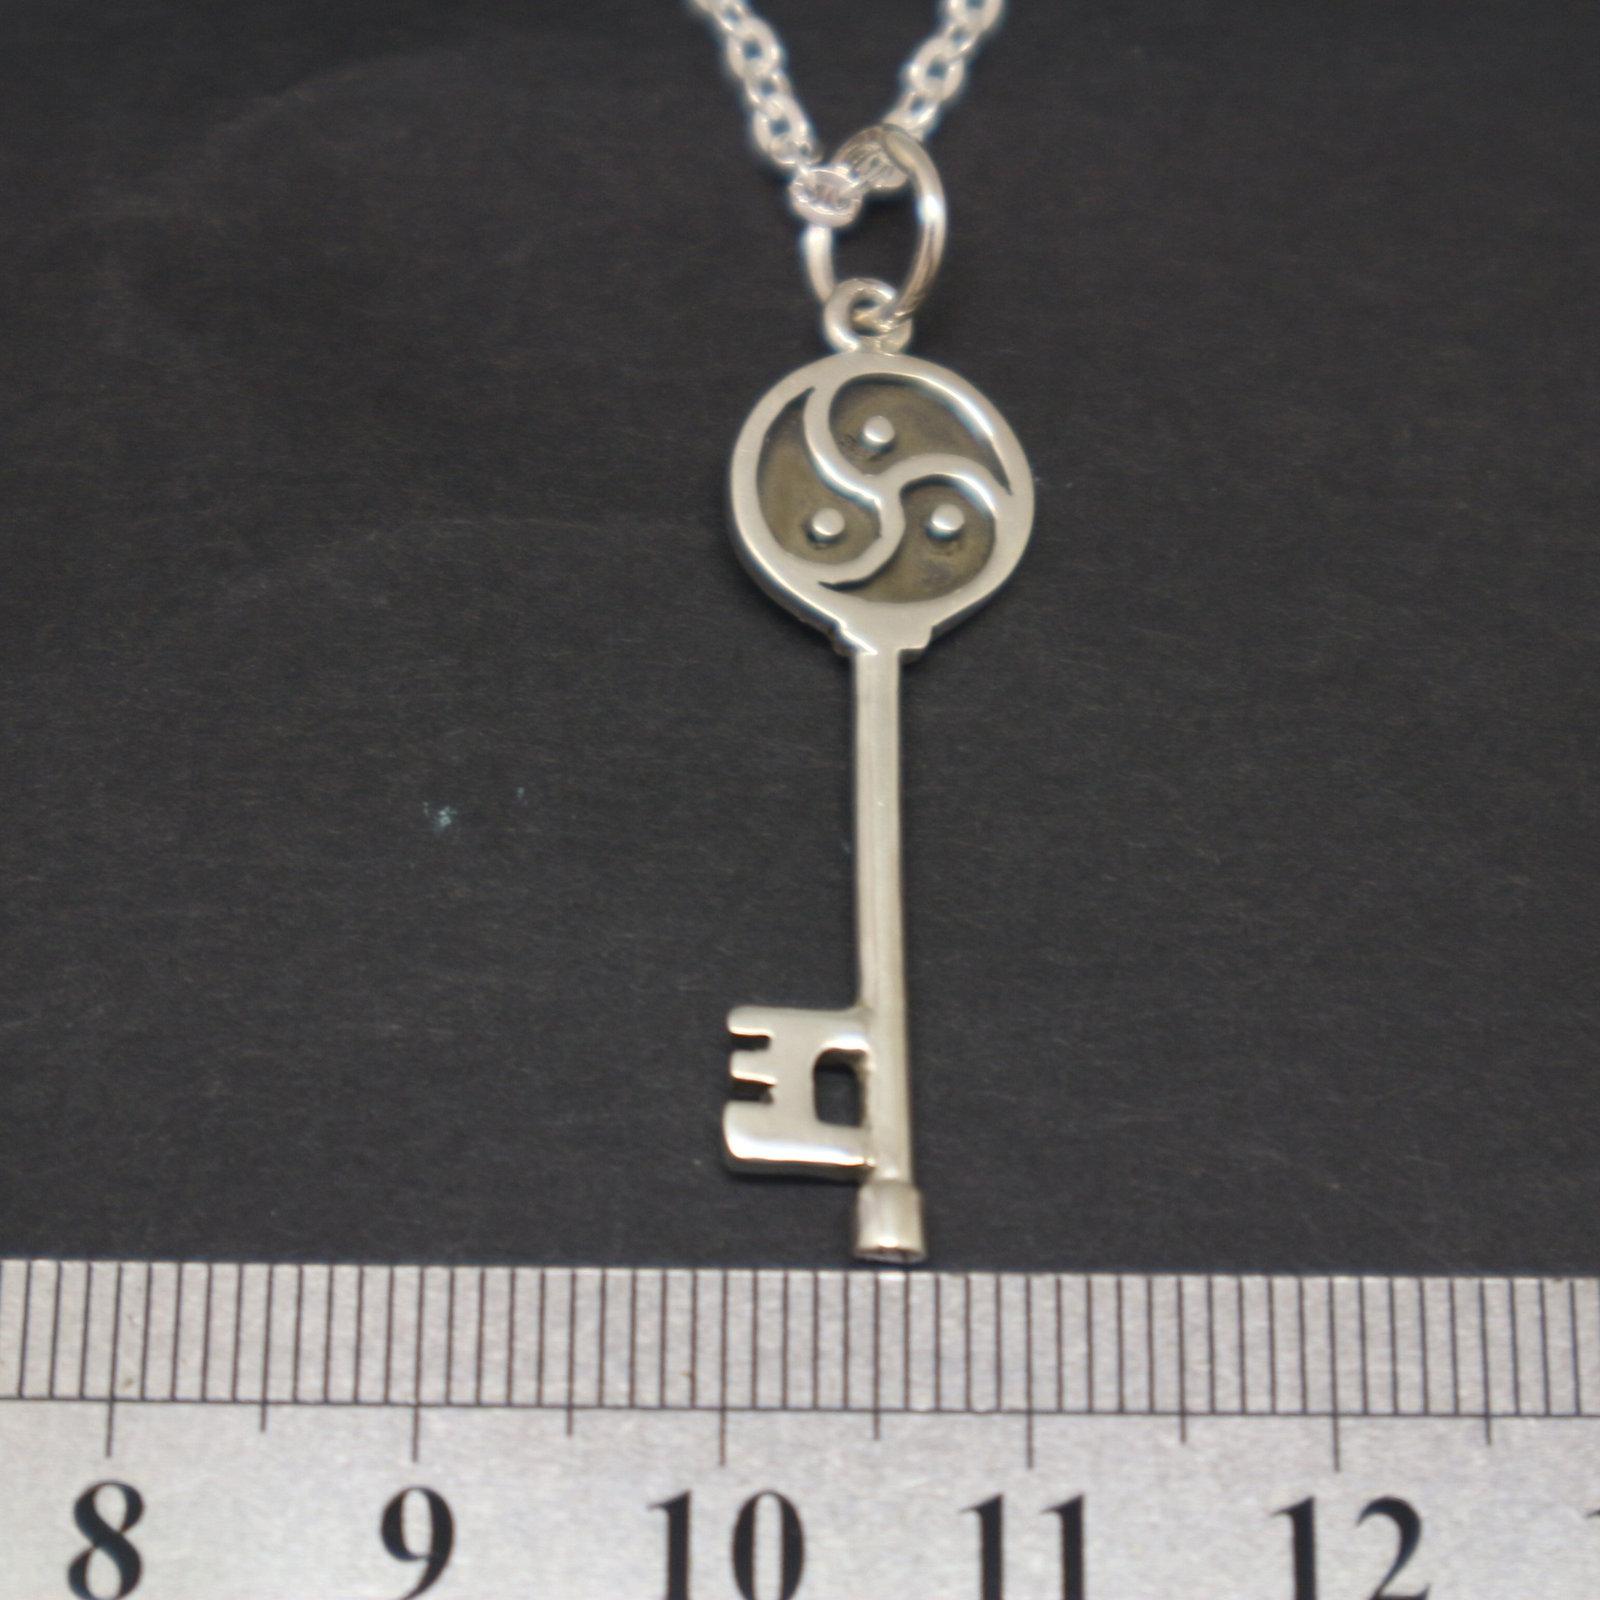 Silver BDSM Key Necklace Pendant image 3